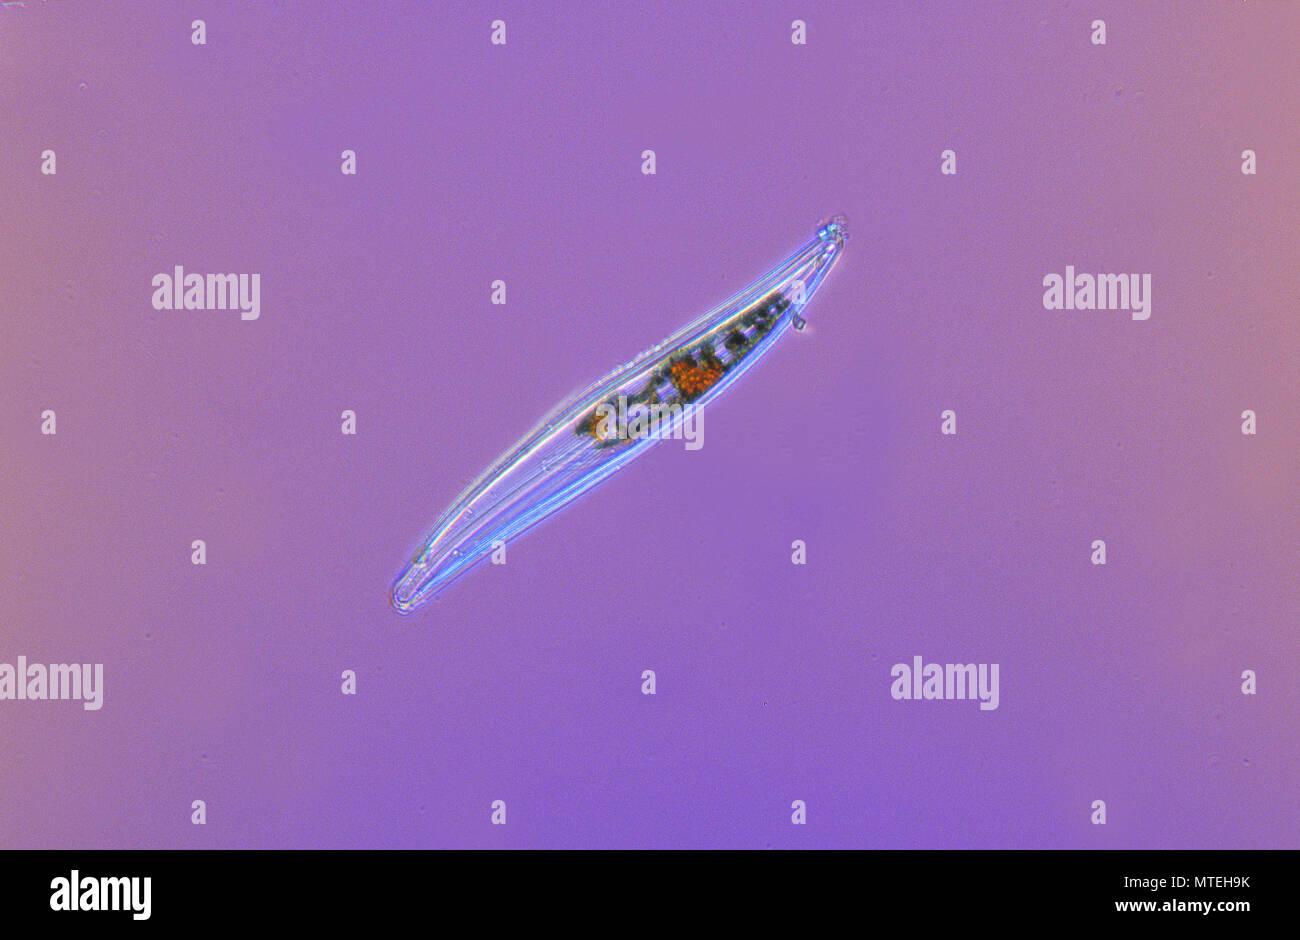 Gyrosigma.Diatom.Seawed.Algae.Optic microscopy - Stock Image